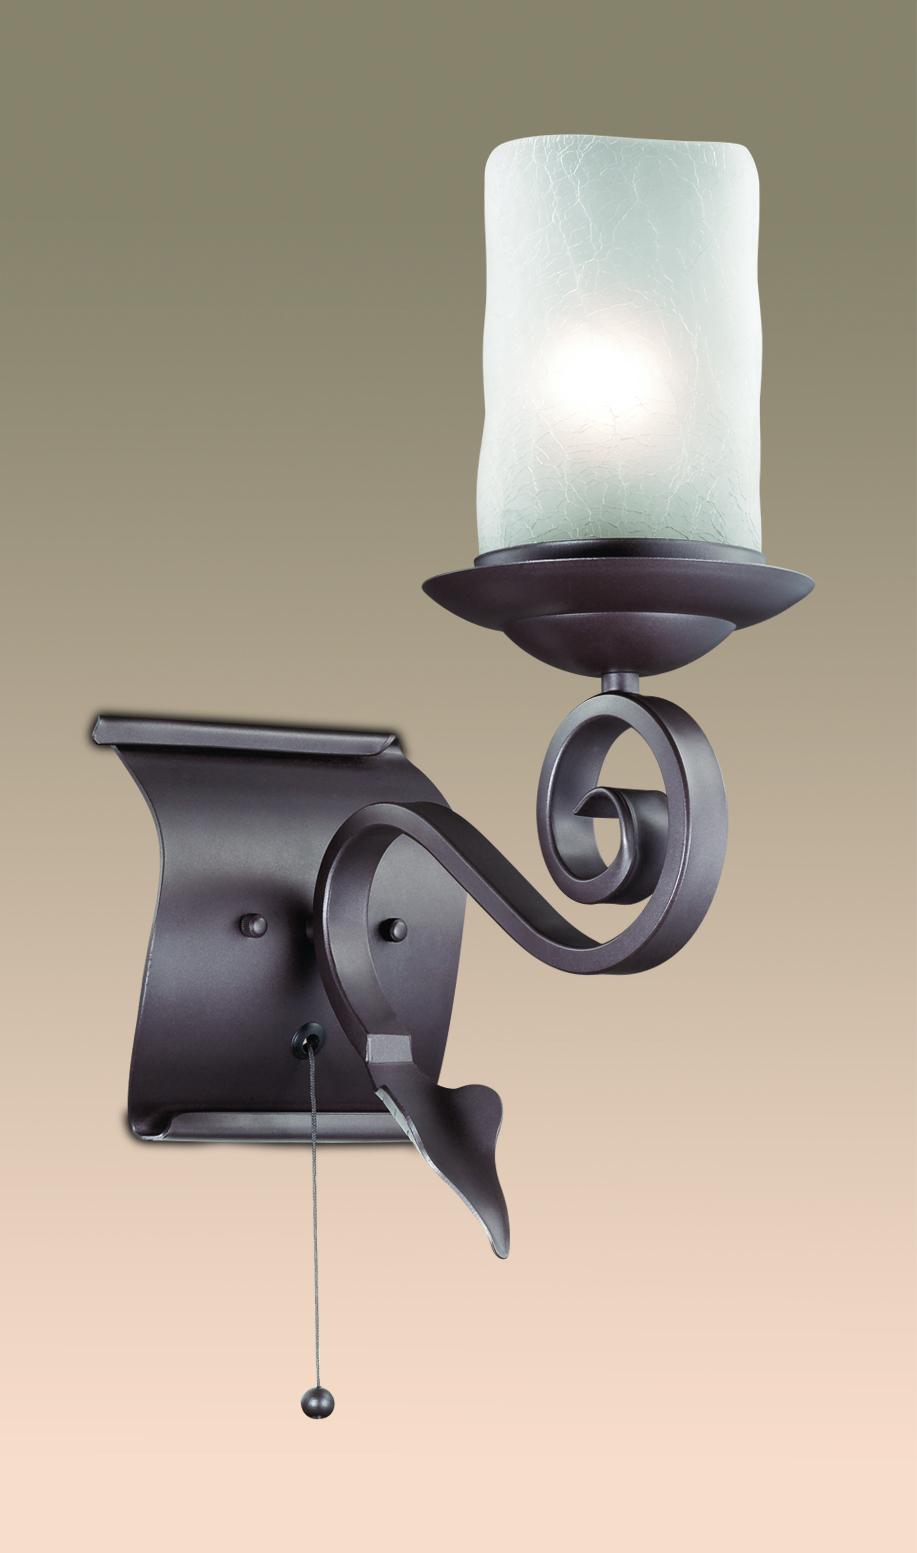 Бра Odeon Light Bosta 2438/1W, 1xE27x60W, коричневый, белый, металл, стекло - фото 1